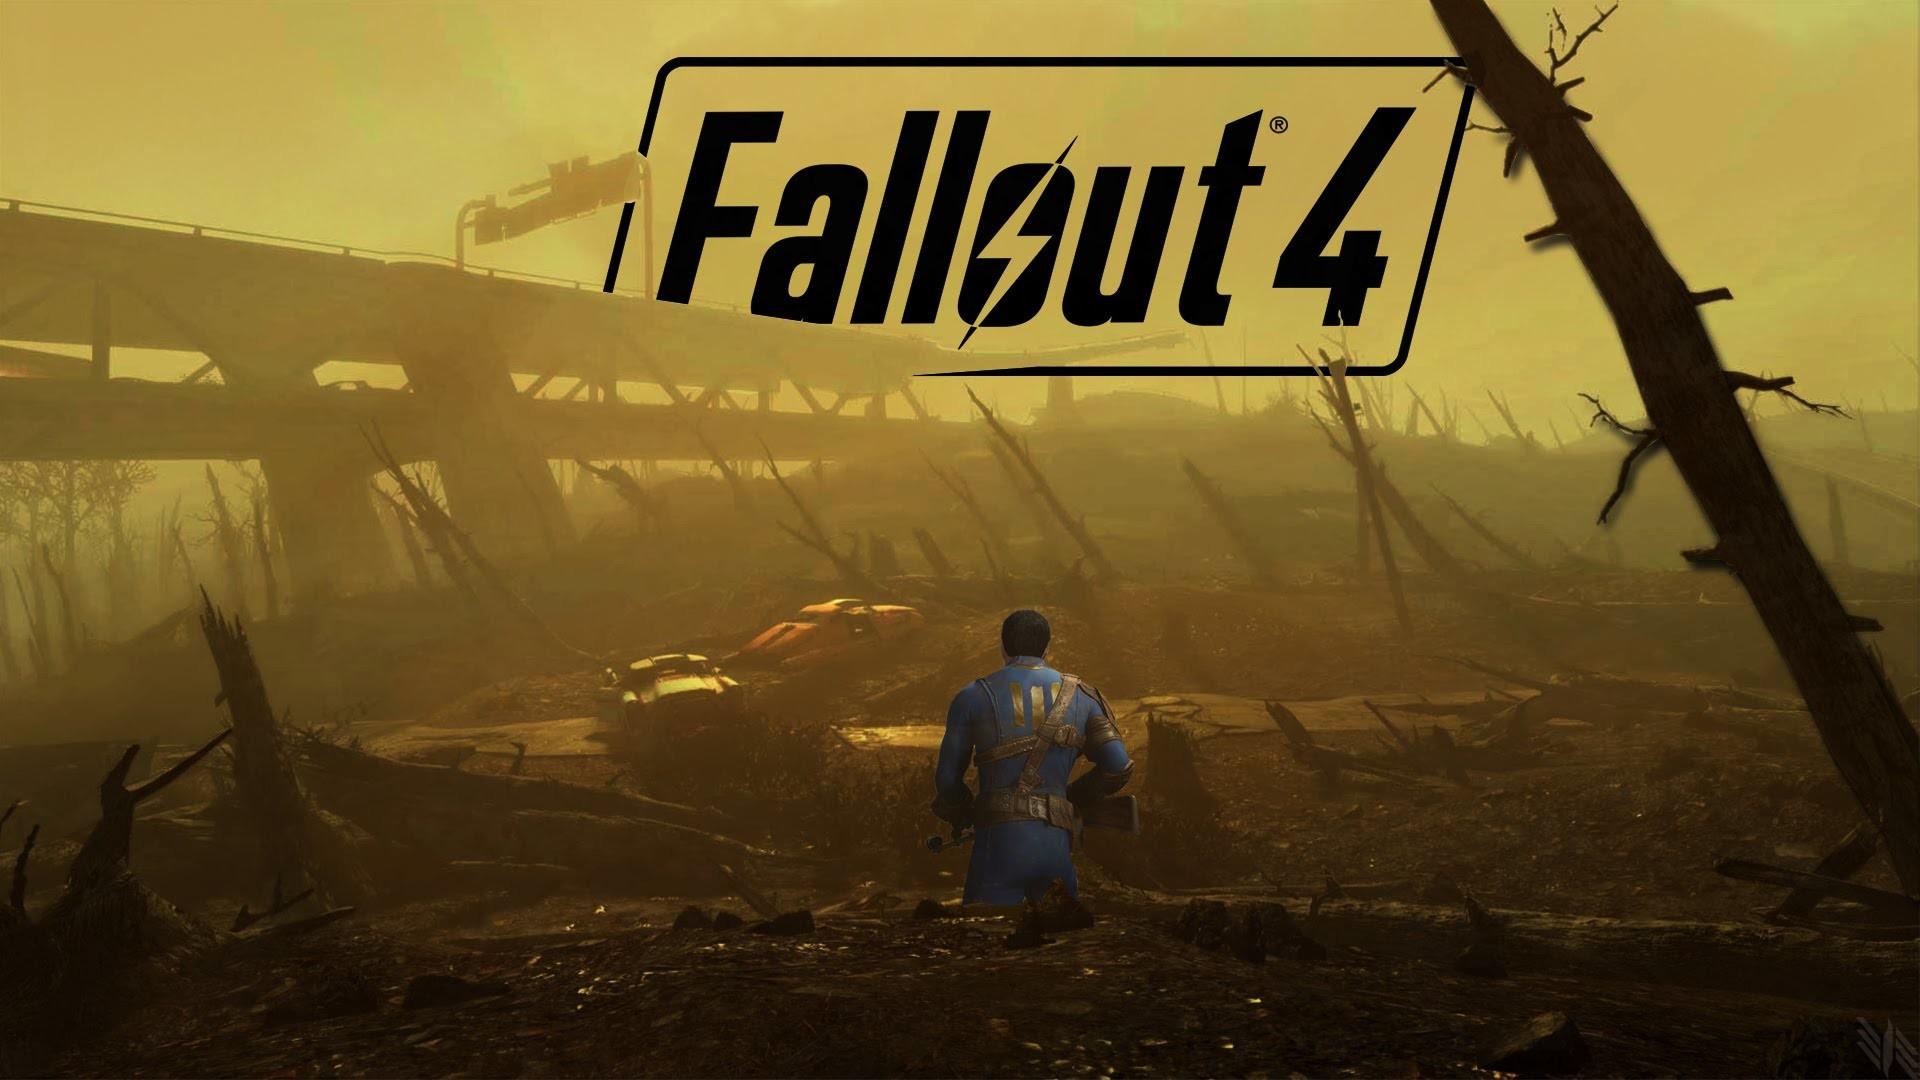 Fallout 4 wallpaper 1920x1080 77 images - Fallout new vegas skyline ...